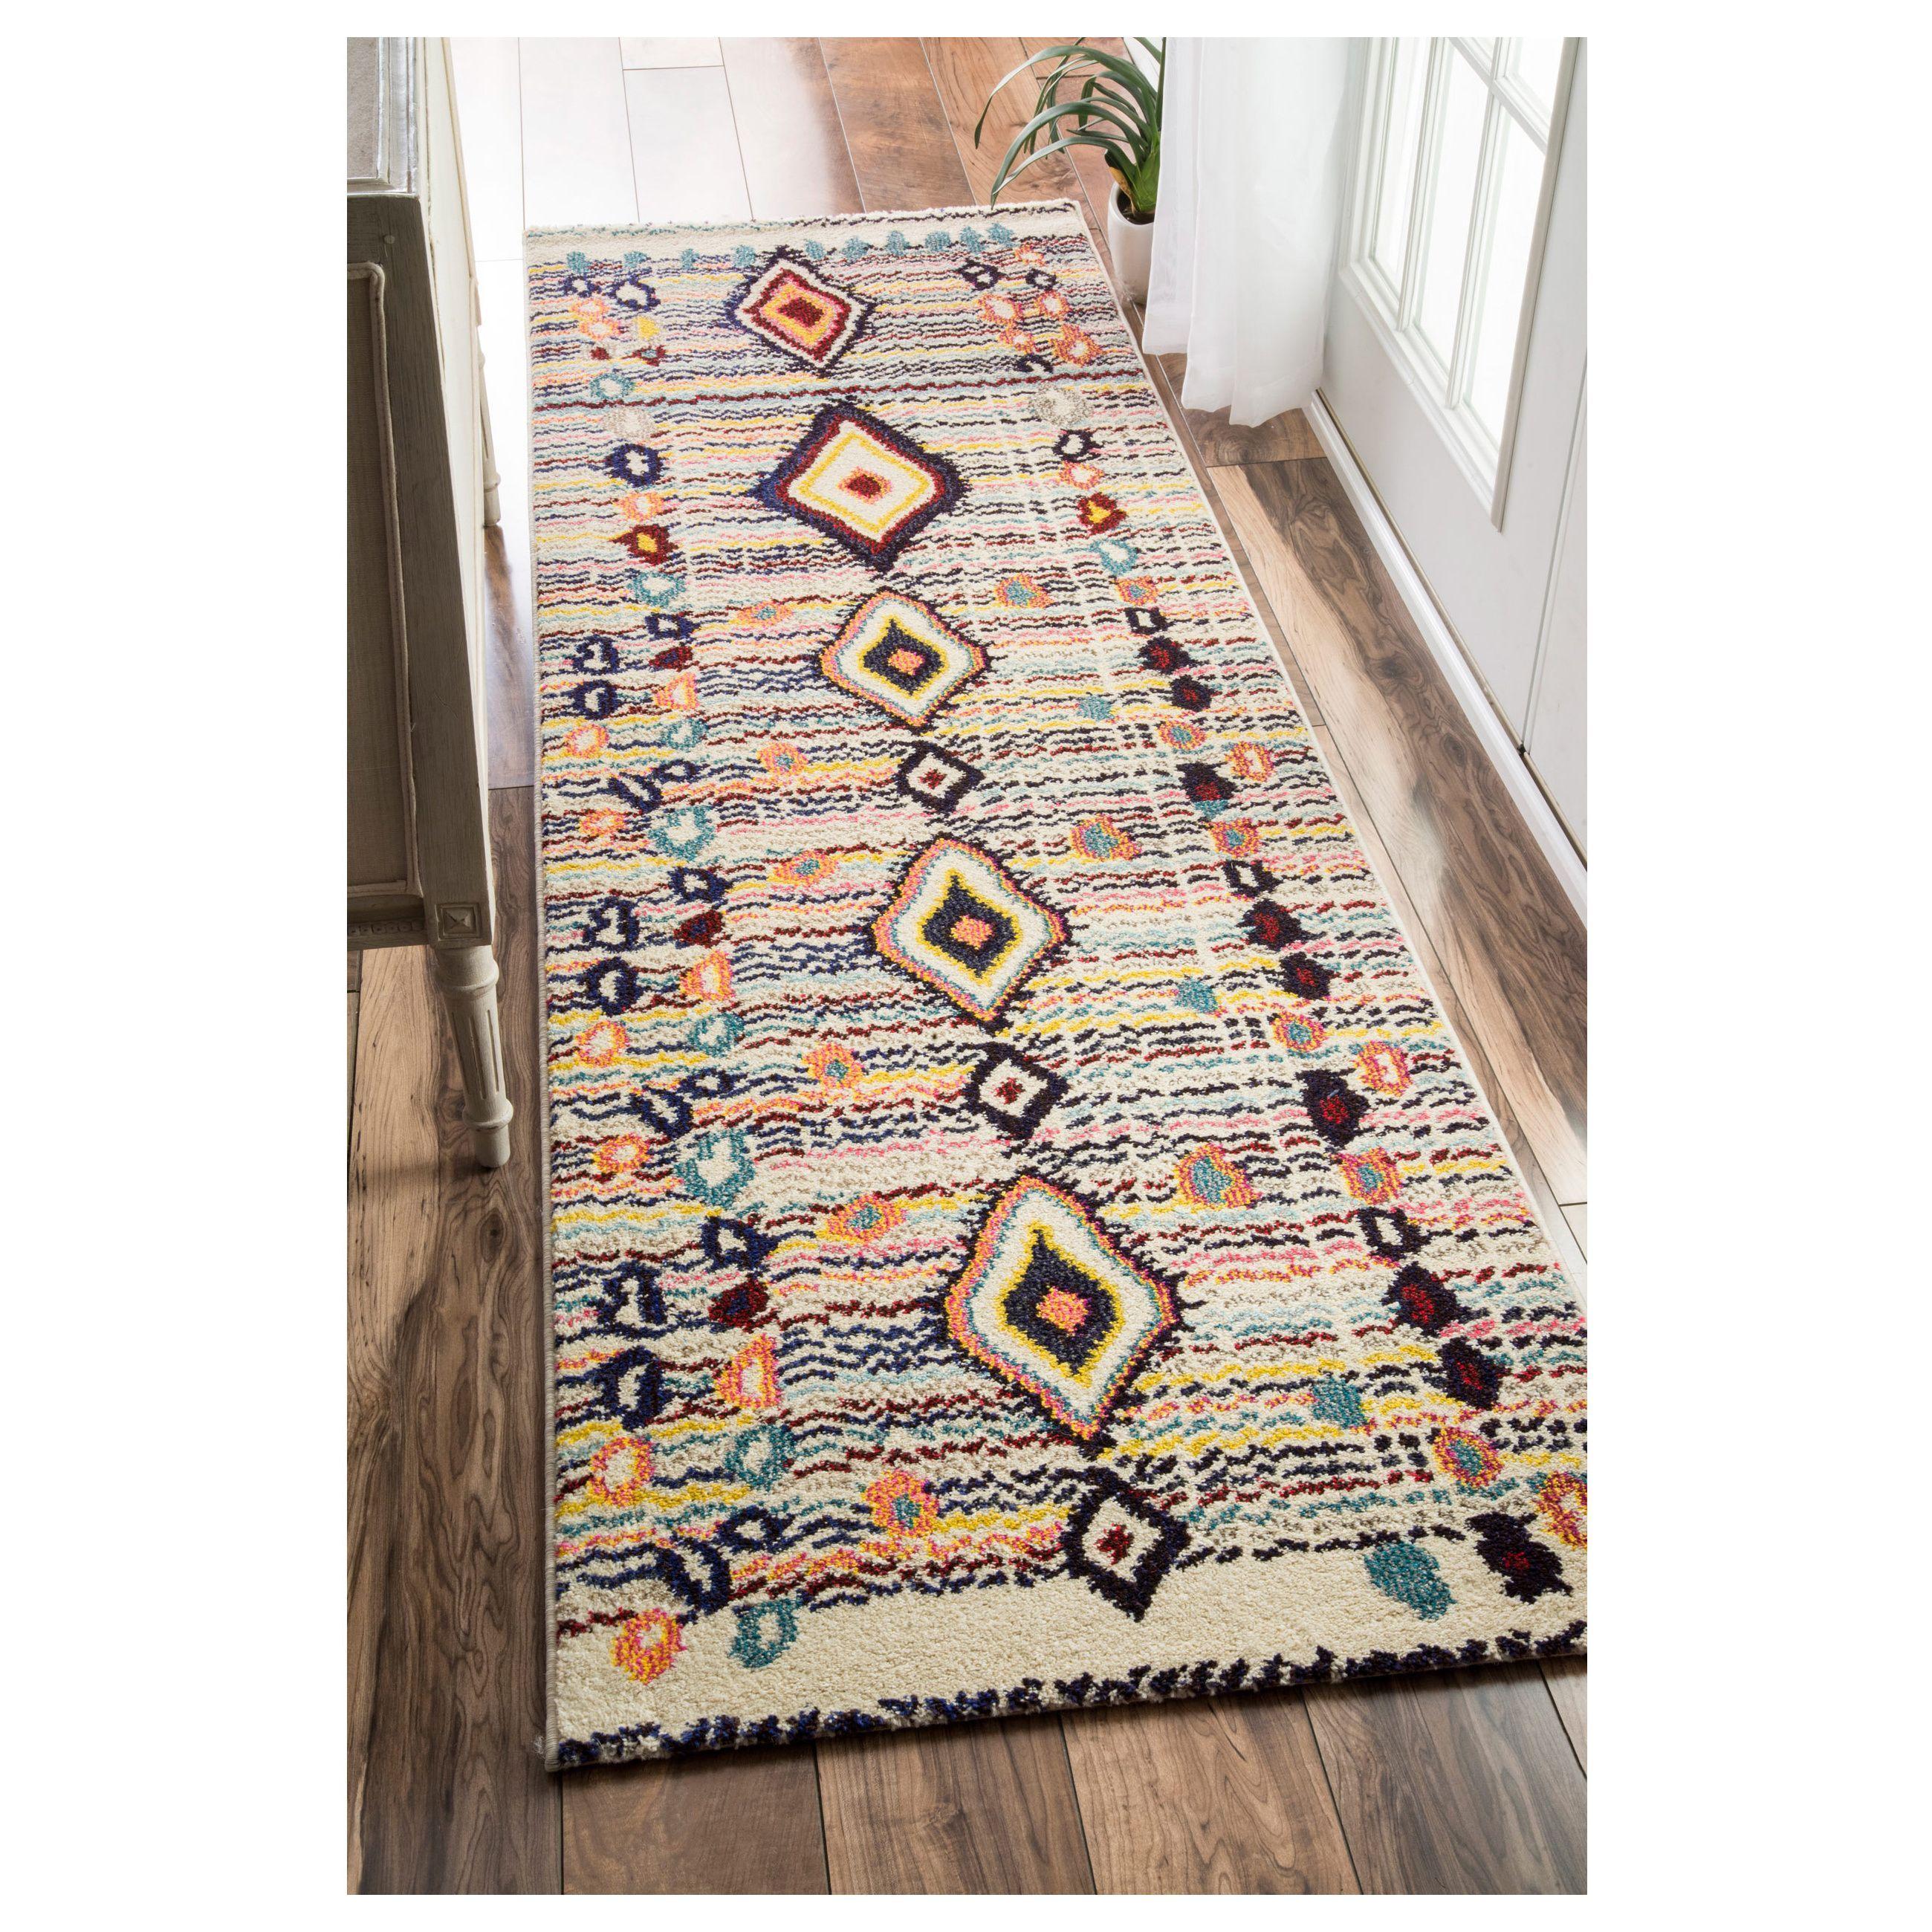 Hallway carpet runners sold by the foot  nuLOOM Moroccan Striped Diamonds Multi Runner Rug u x u by Nuloom